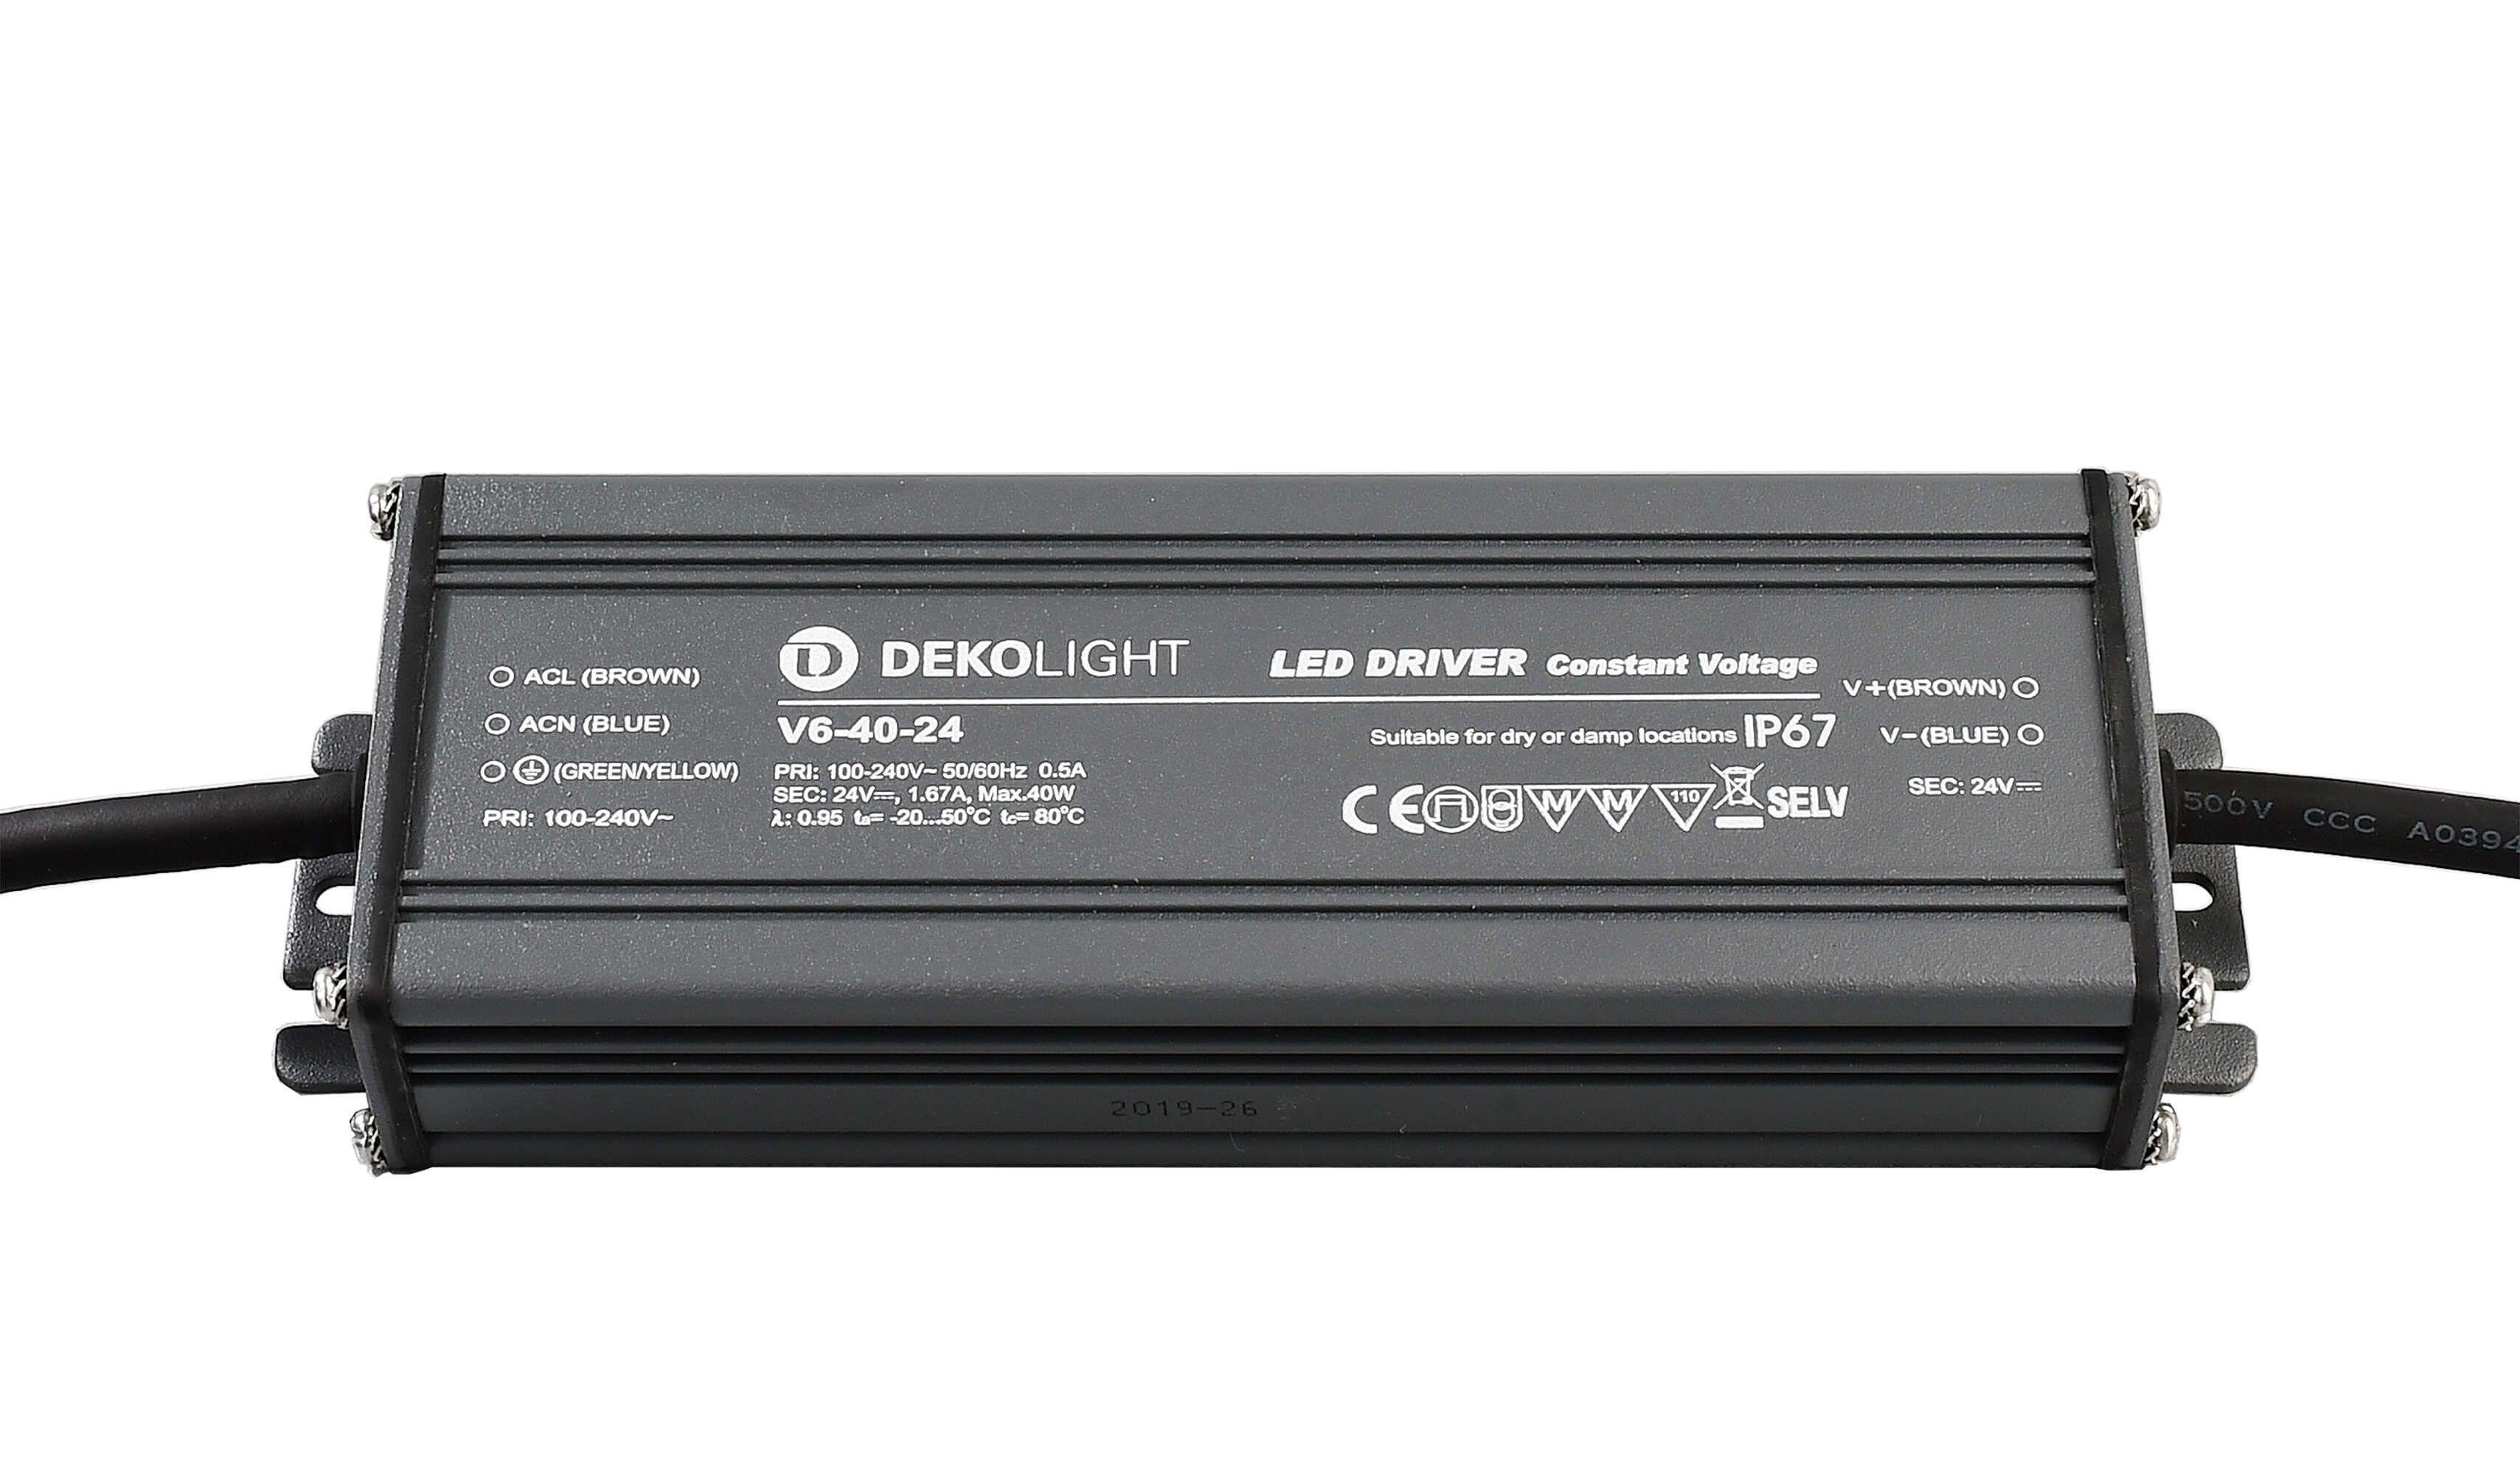 Netzgerät  IP, CV, V6-40-24 24V 40W 1670 mA